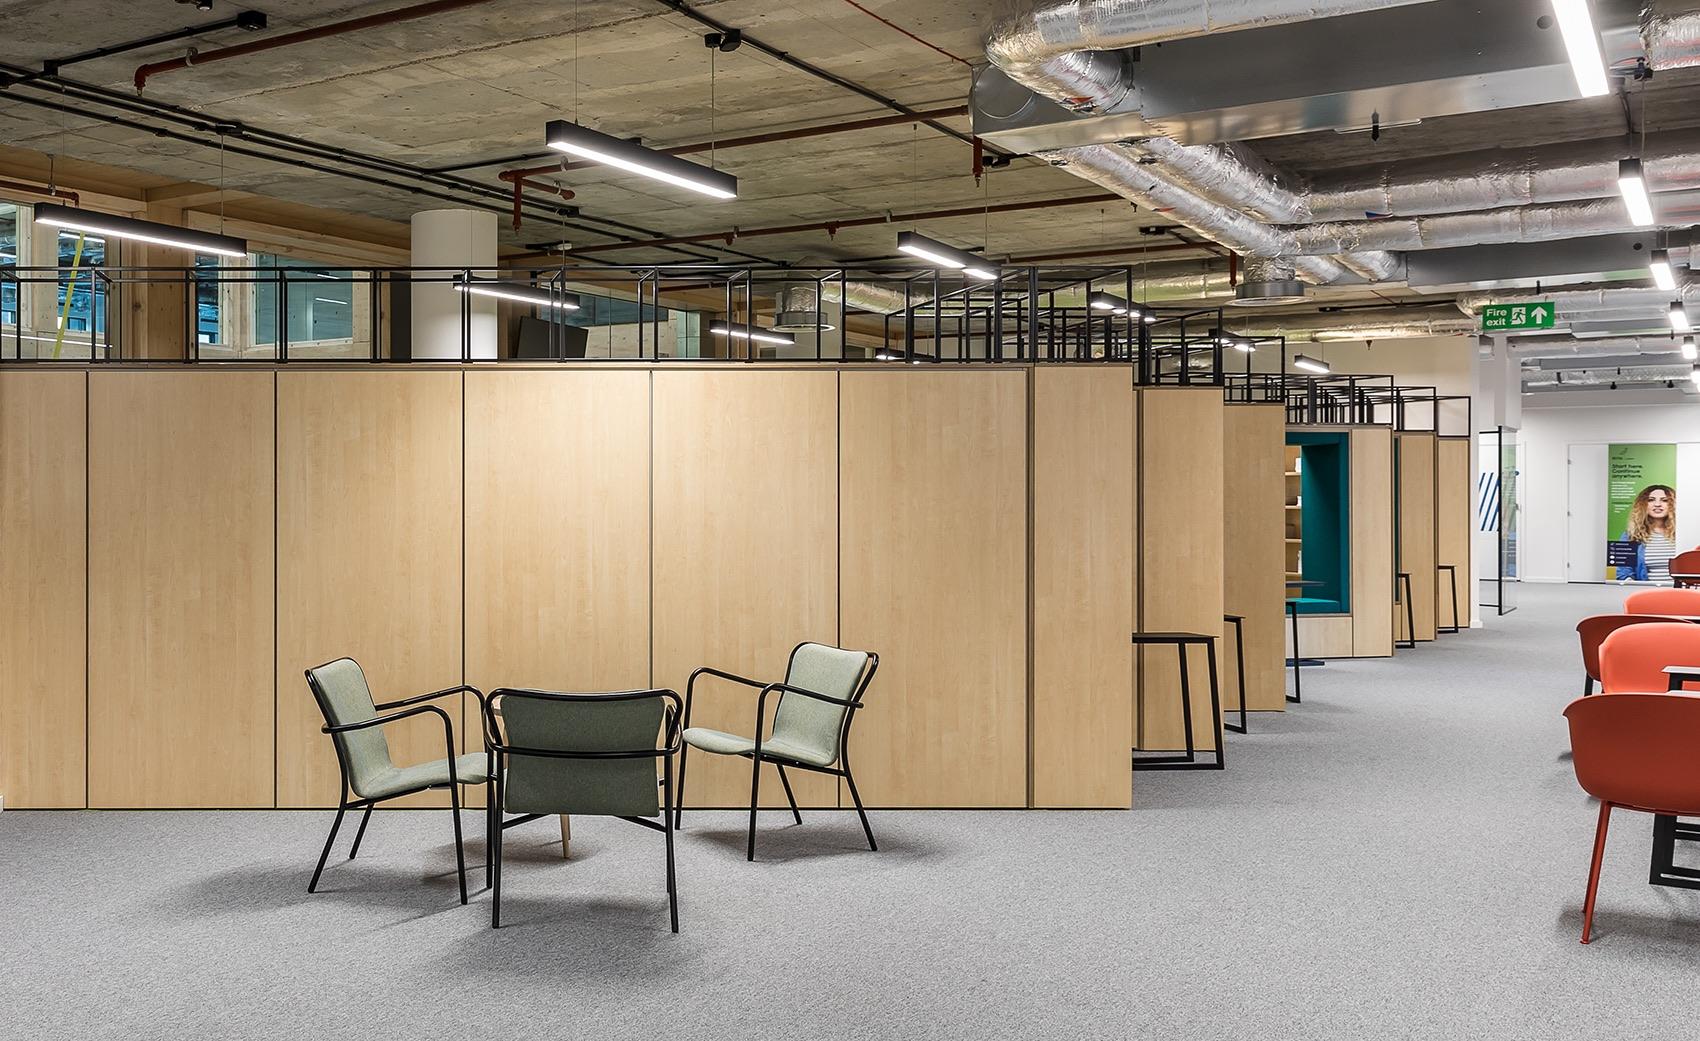 anglia-ruskin-university-office-london-4